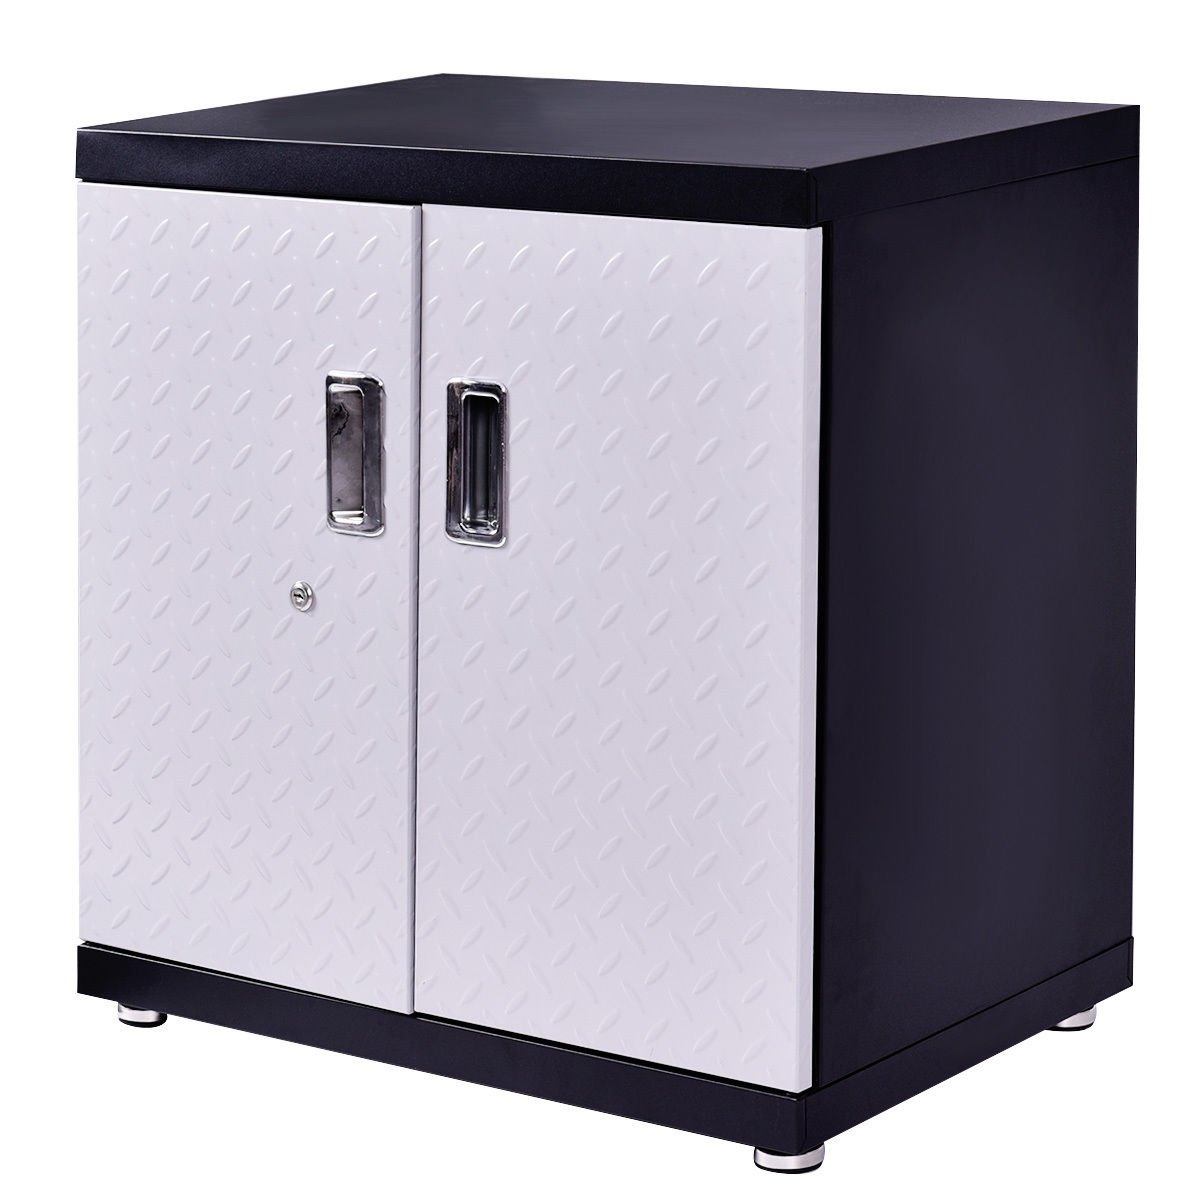 Wall Mount Storage Box Organize by DTOFREE